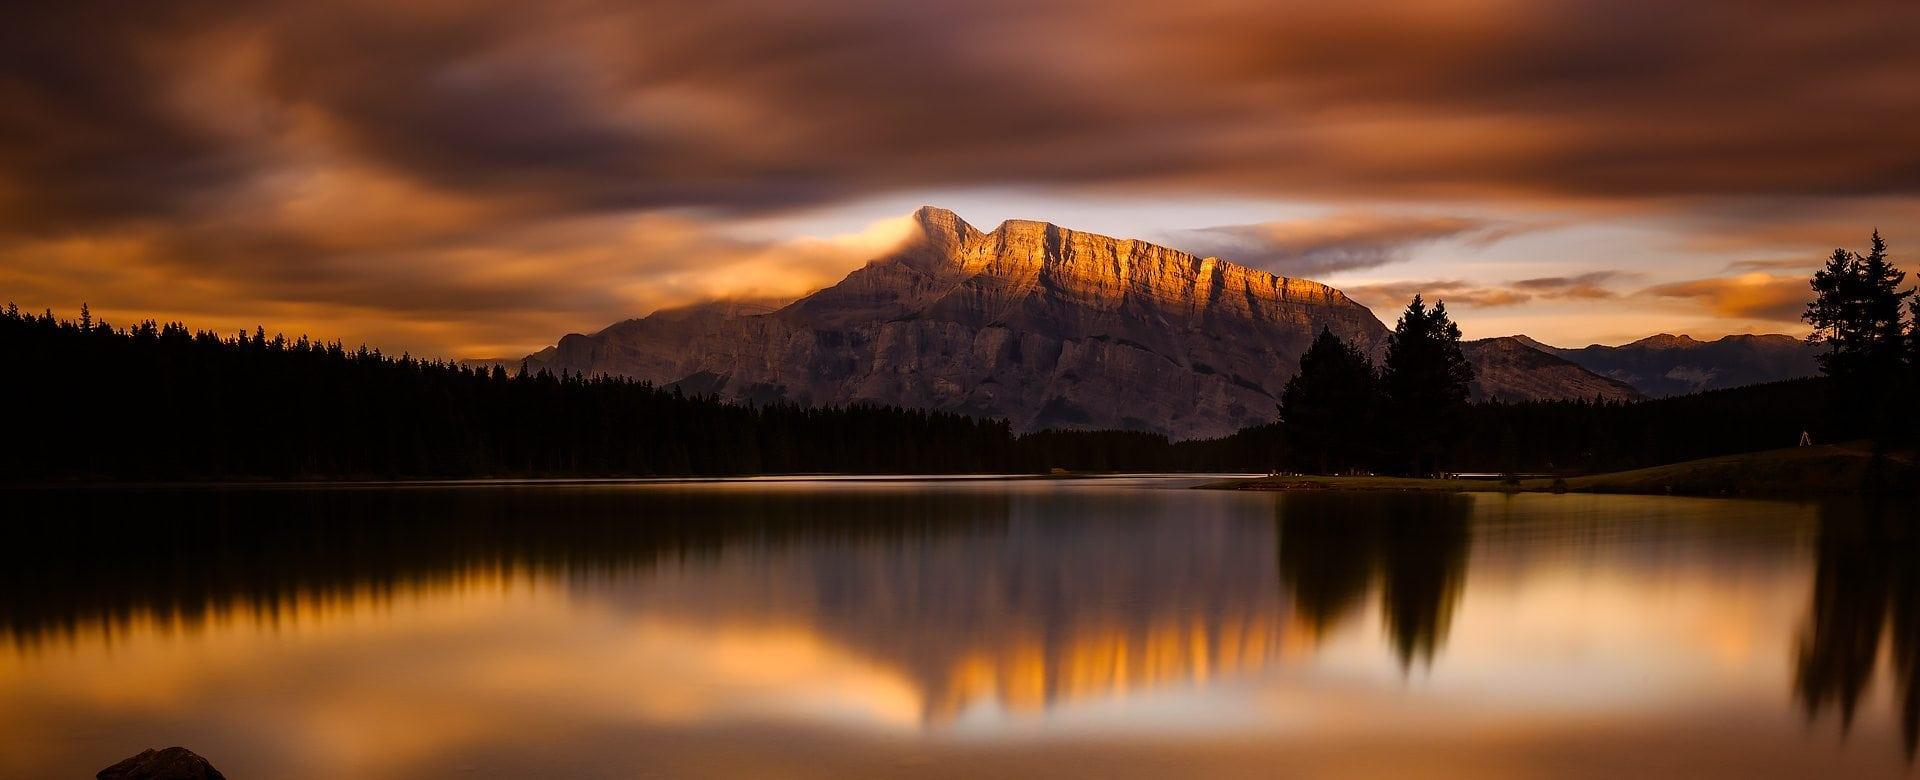 Banff Sunrise Photography Tour